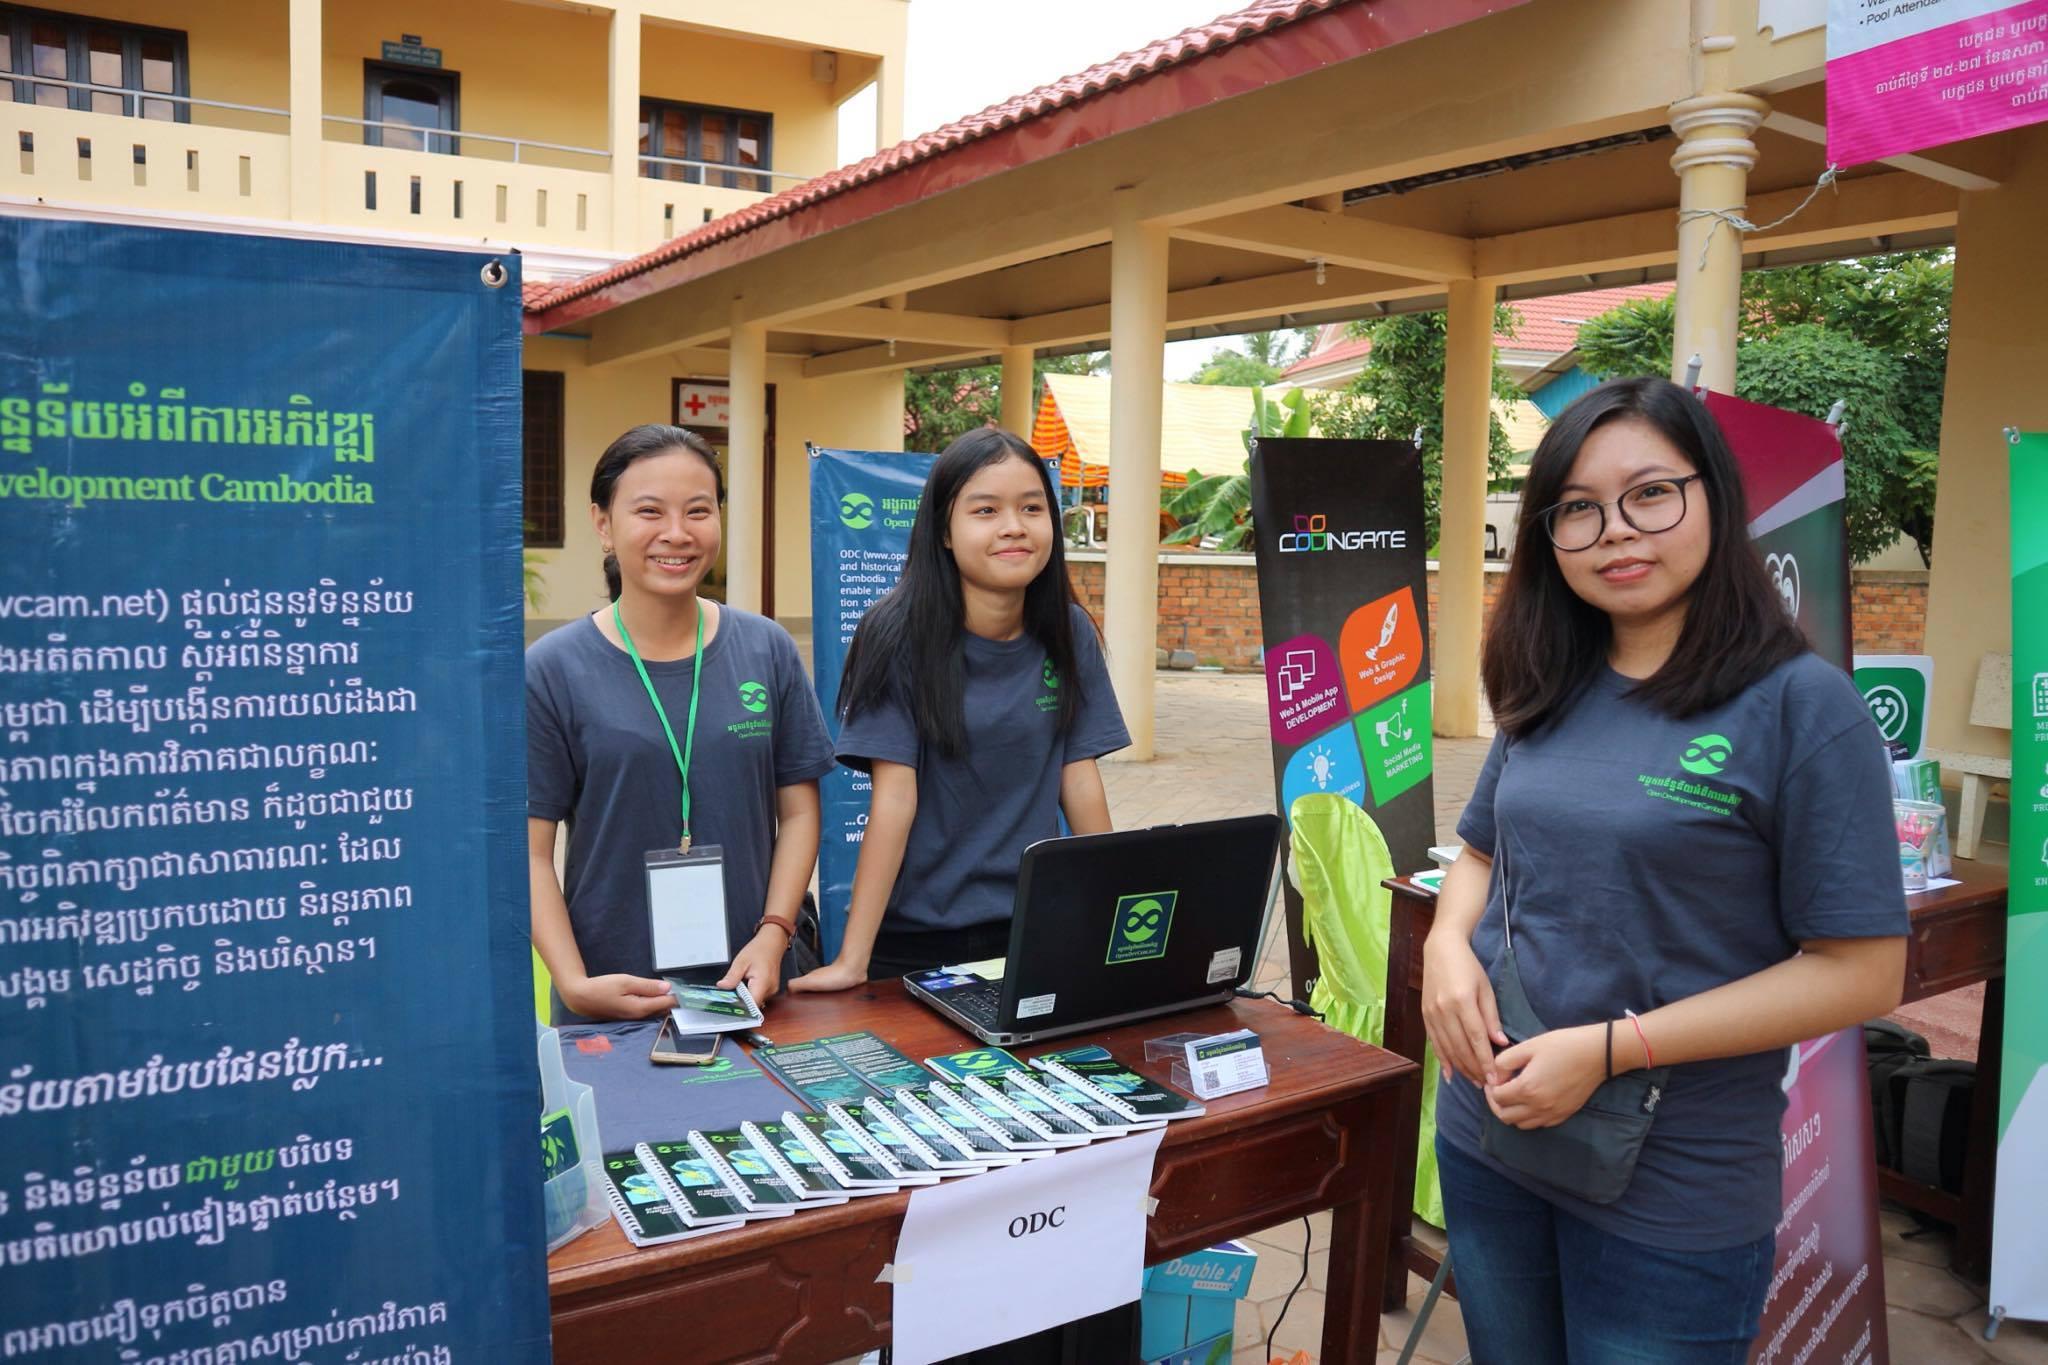 ODC-team-at-the-booth bar camp angkor